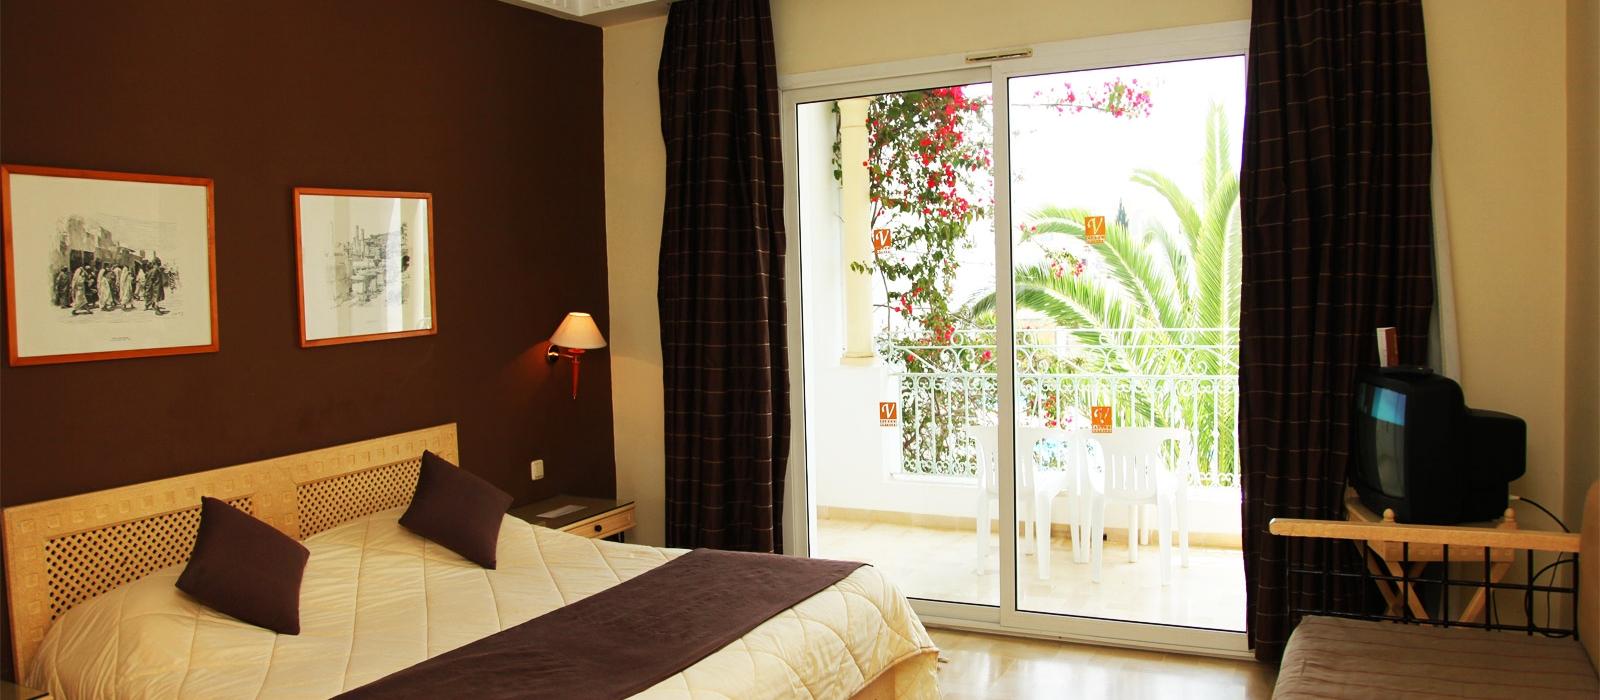 Rooms Hotel Hammamet Flora Park - Vincci Hotels - Triple Room